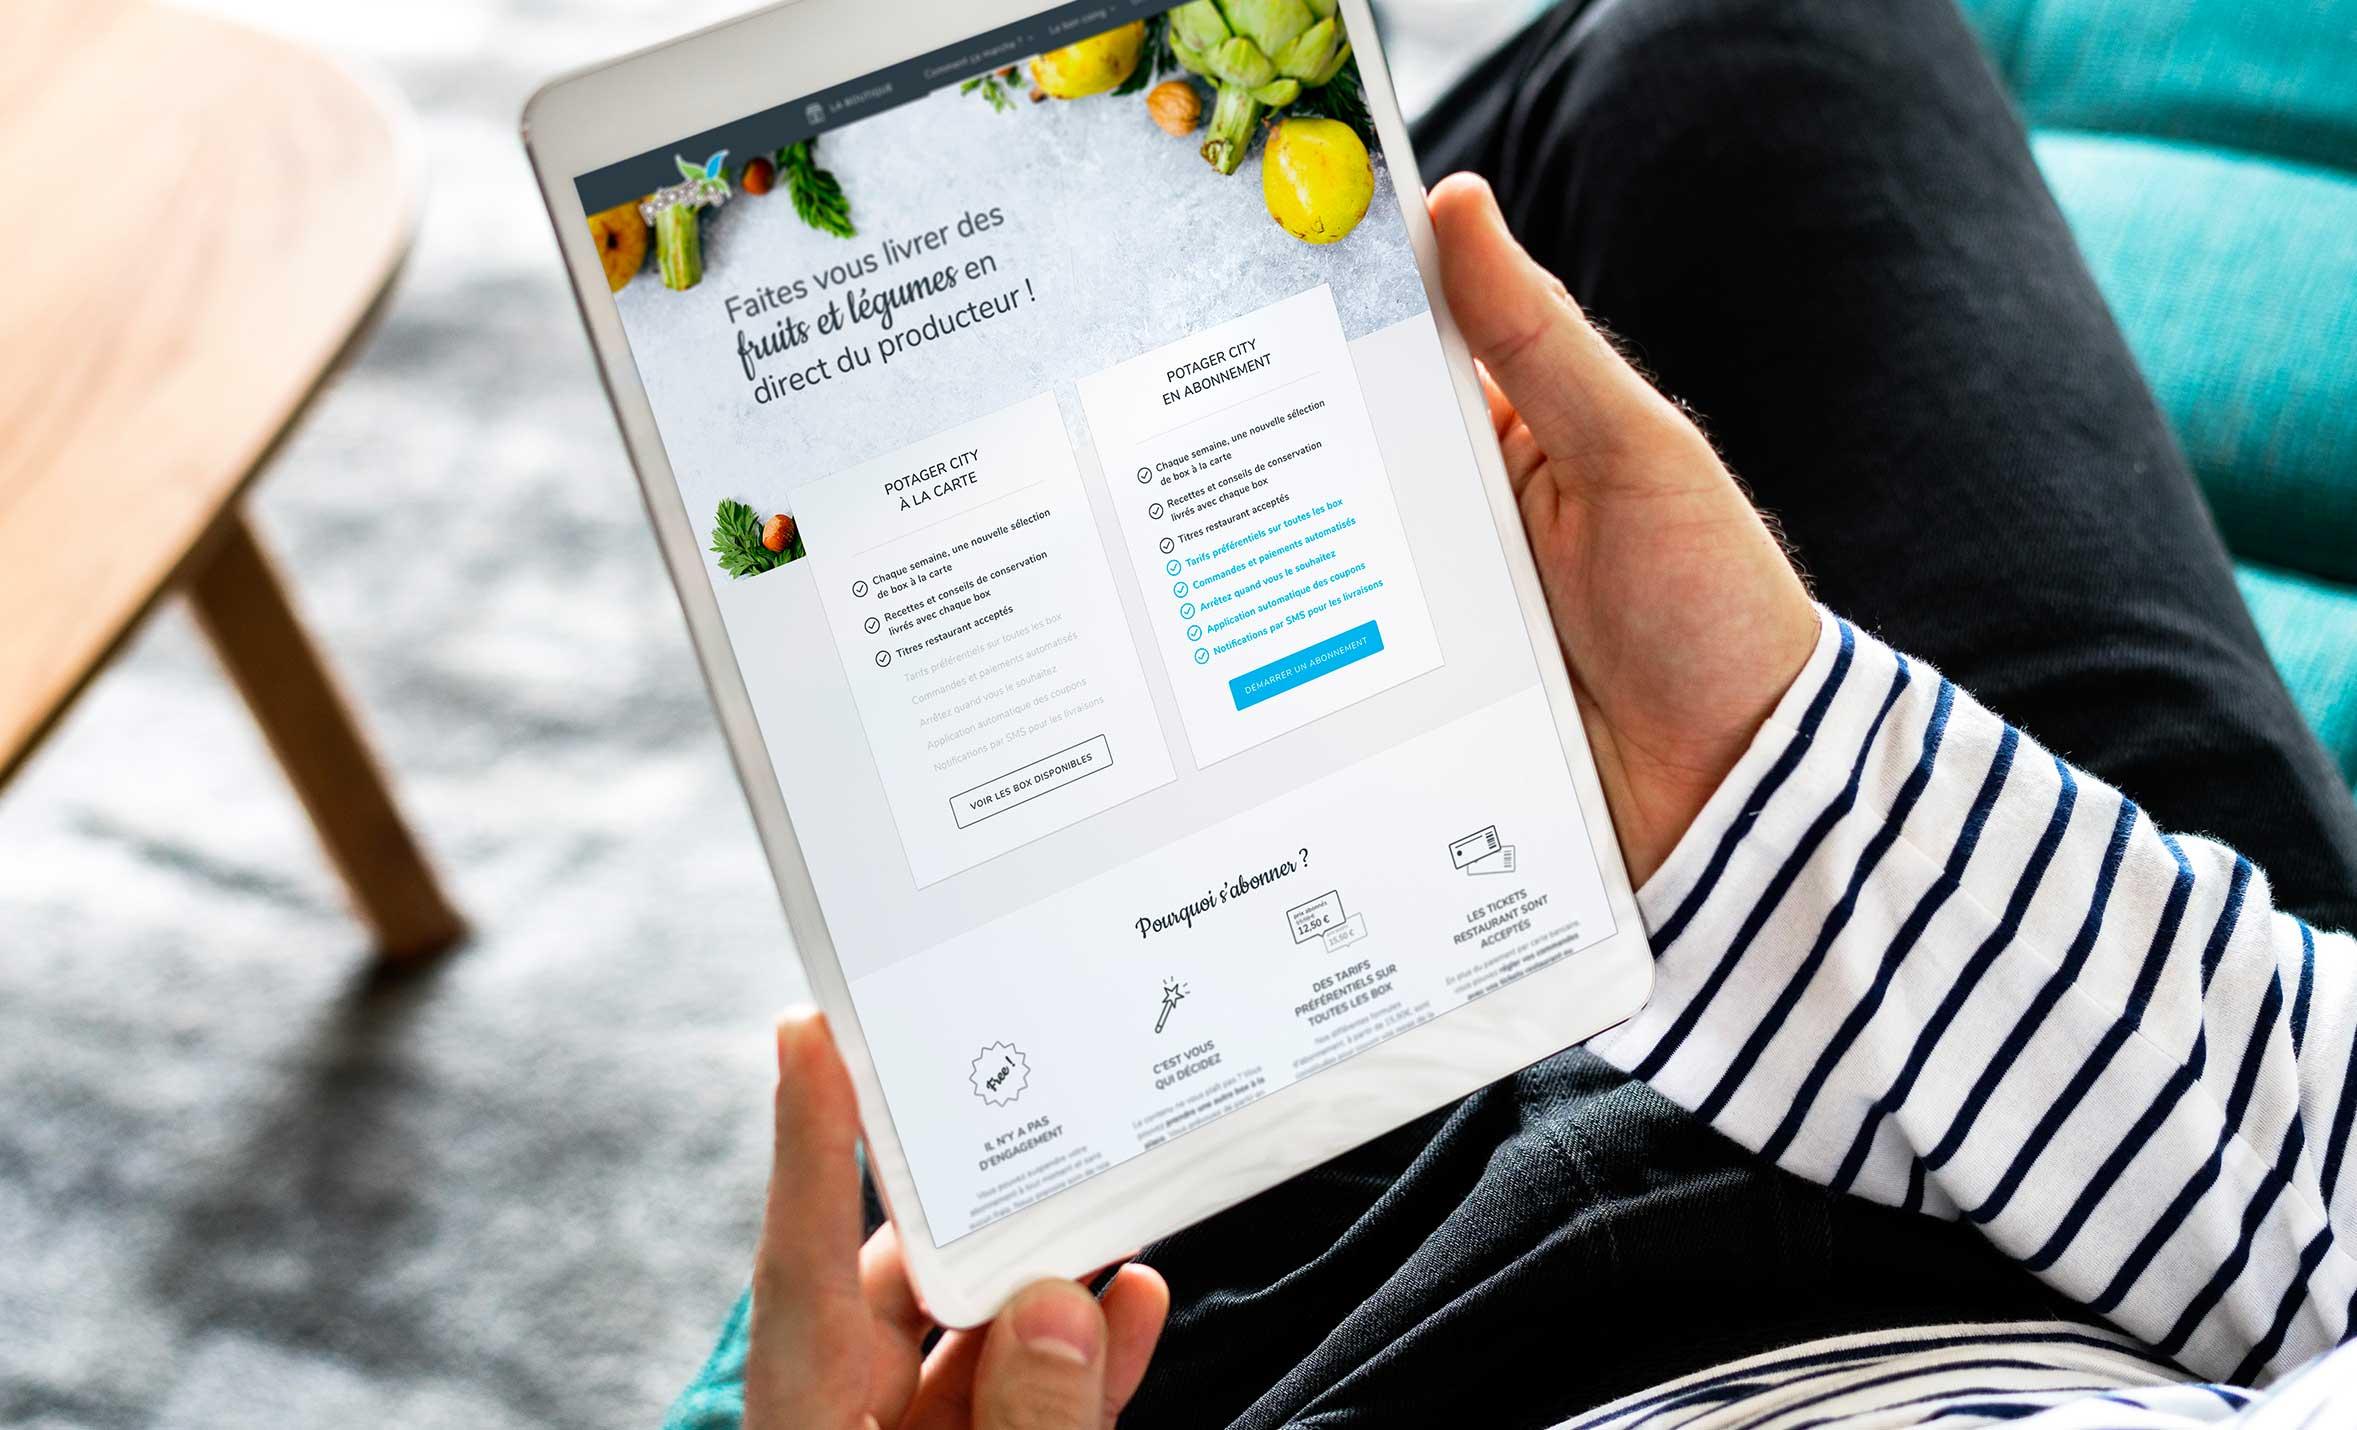 Claudia Berger - Webdesign et design application smartphone - Potager City - tablette